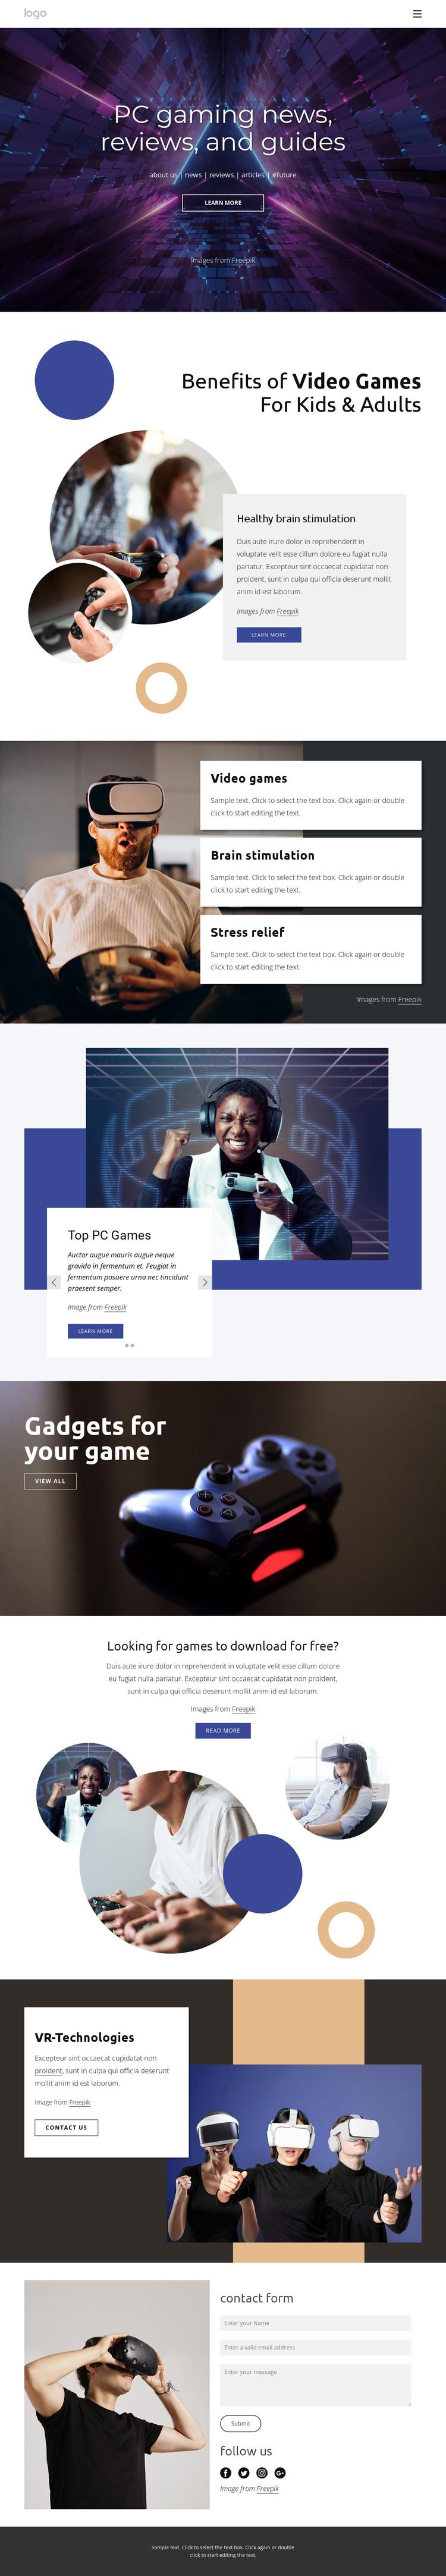 PC gaming news Joomla Template